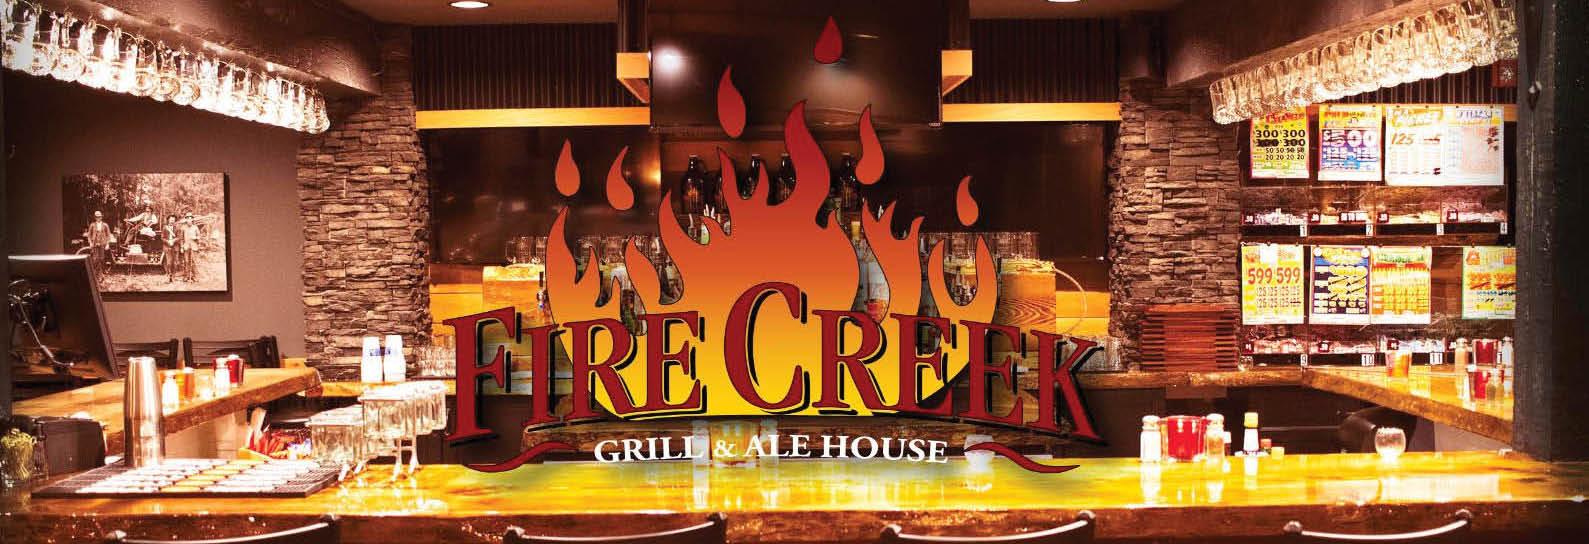 Fire Creek Grill & Ale House main banner image - Lacey, WA - Olympia, WA